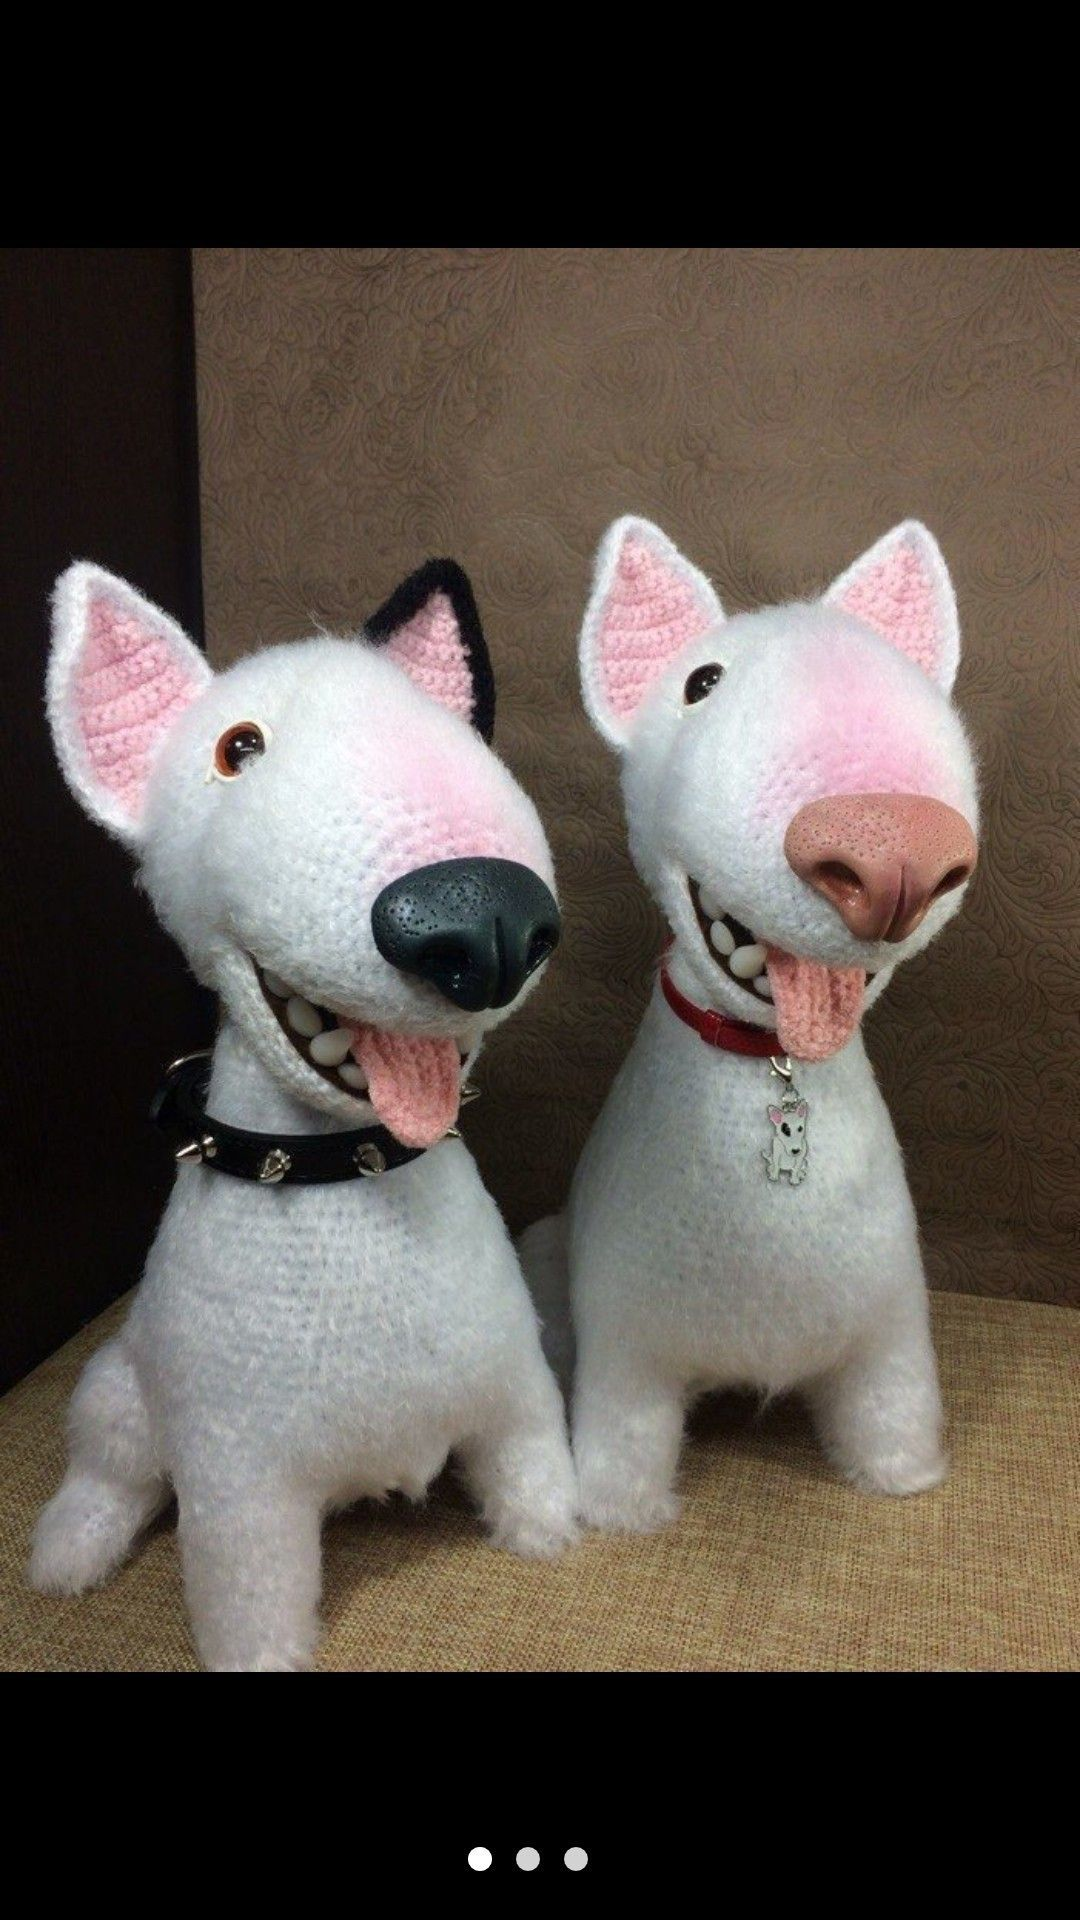 English Bull Terrier Amigurumi Crochet Pet Toy A Copy Of The Pet Dog Toypetdog Bull Terrier Crochet Dog Dog Toys